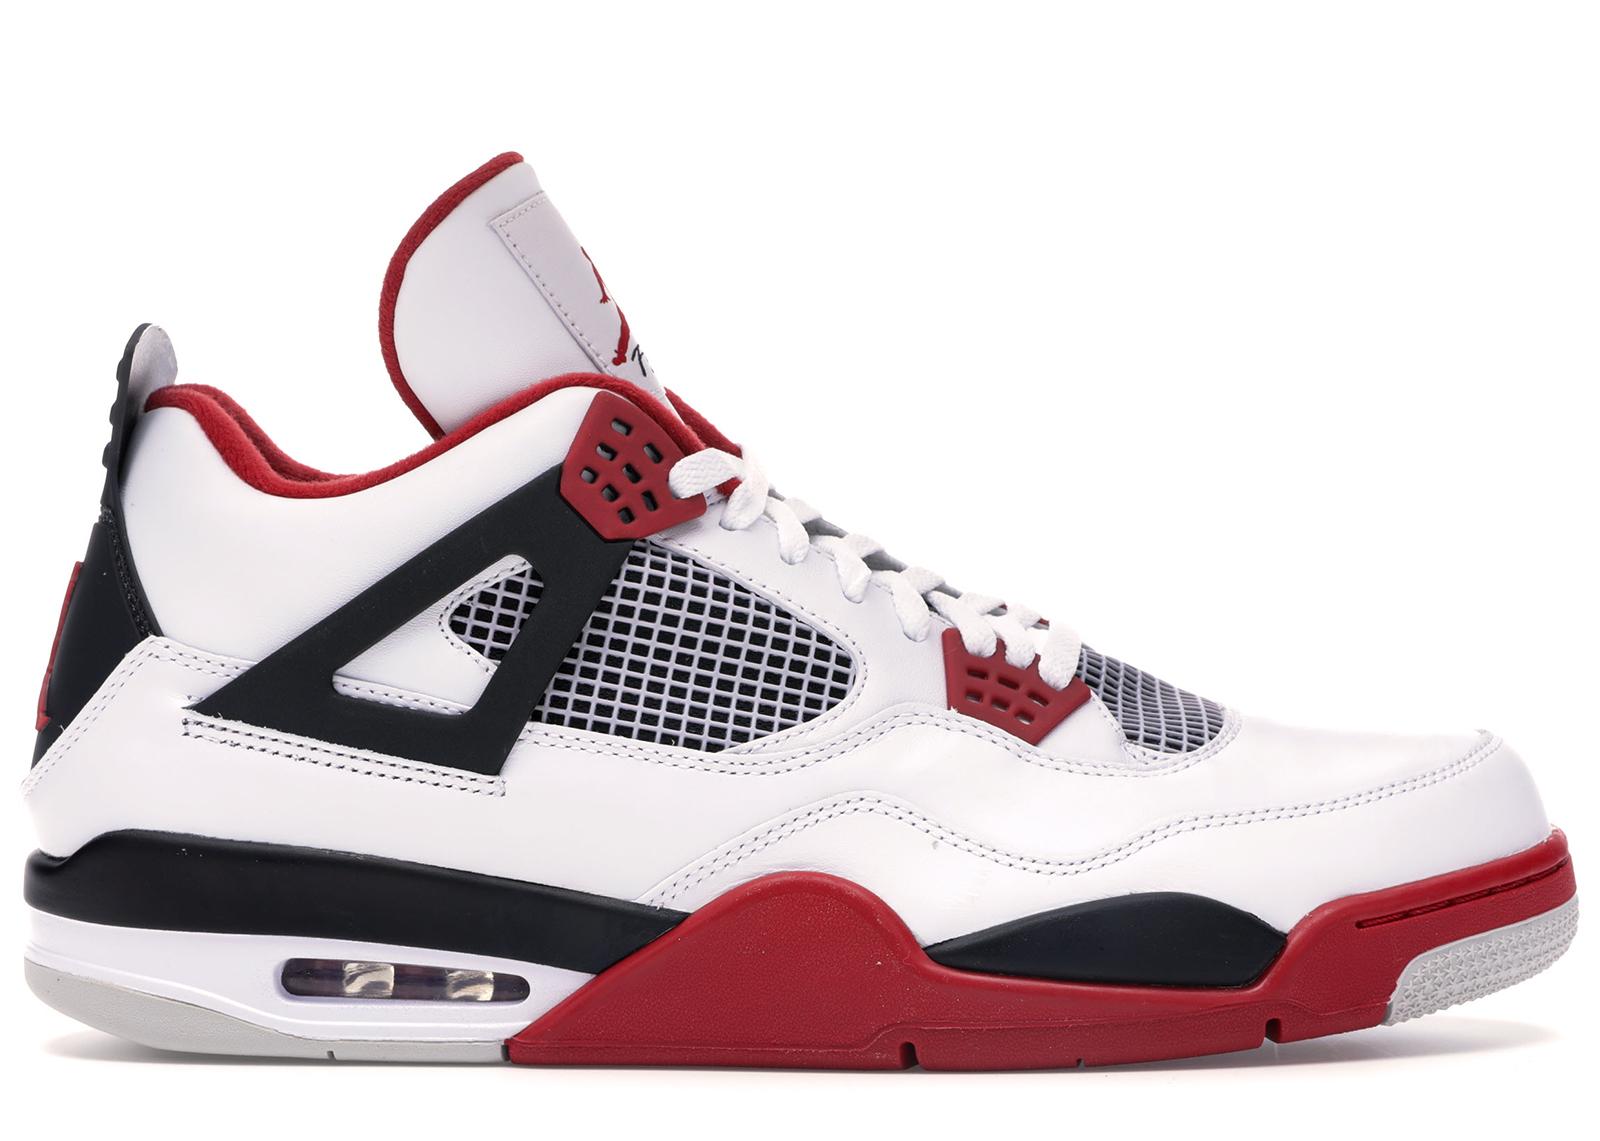 Jordan 4 Retro Fire Red (2012) - 308497-110